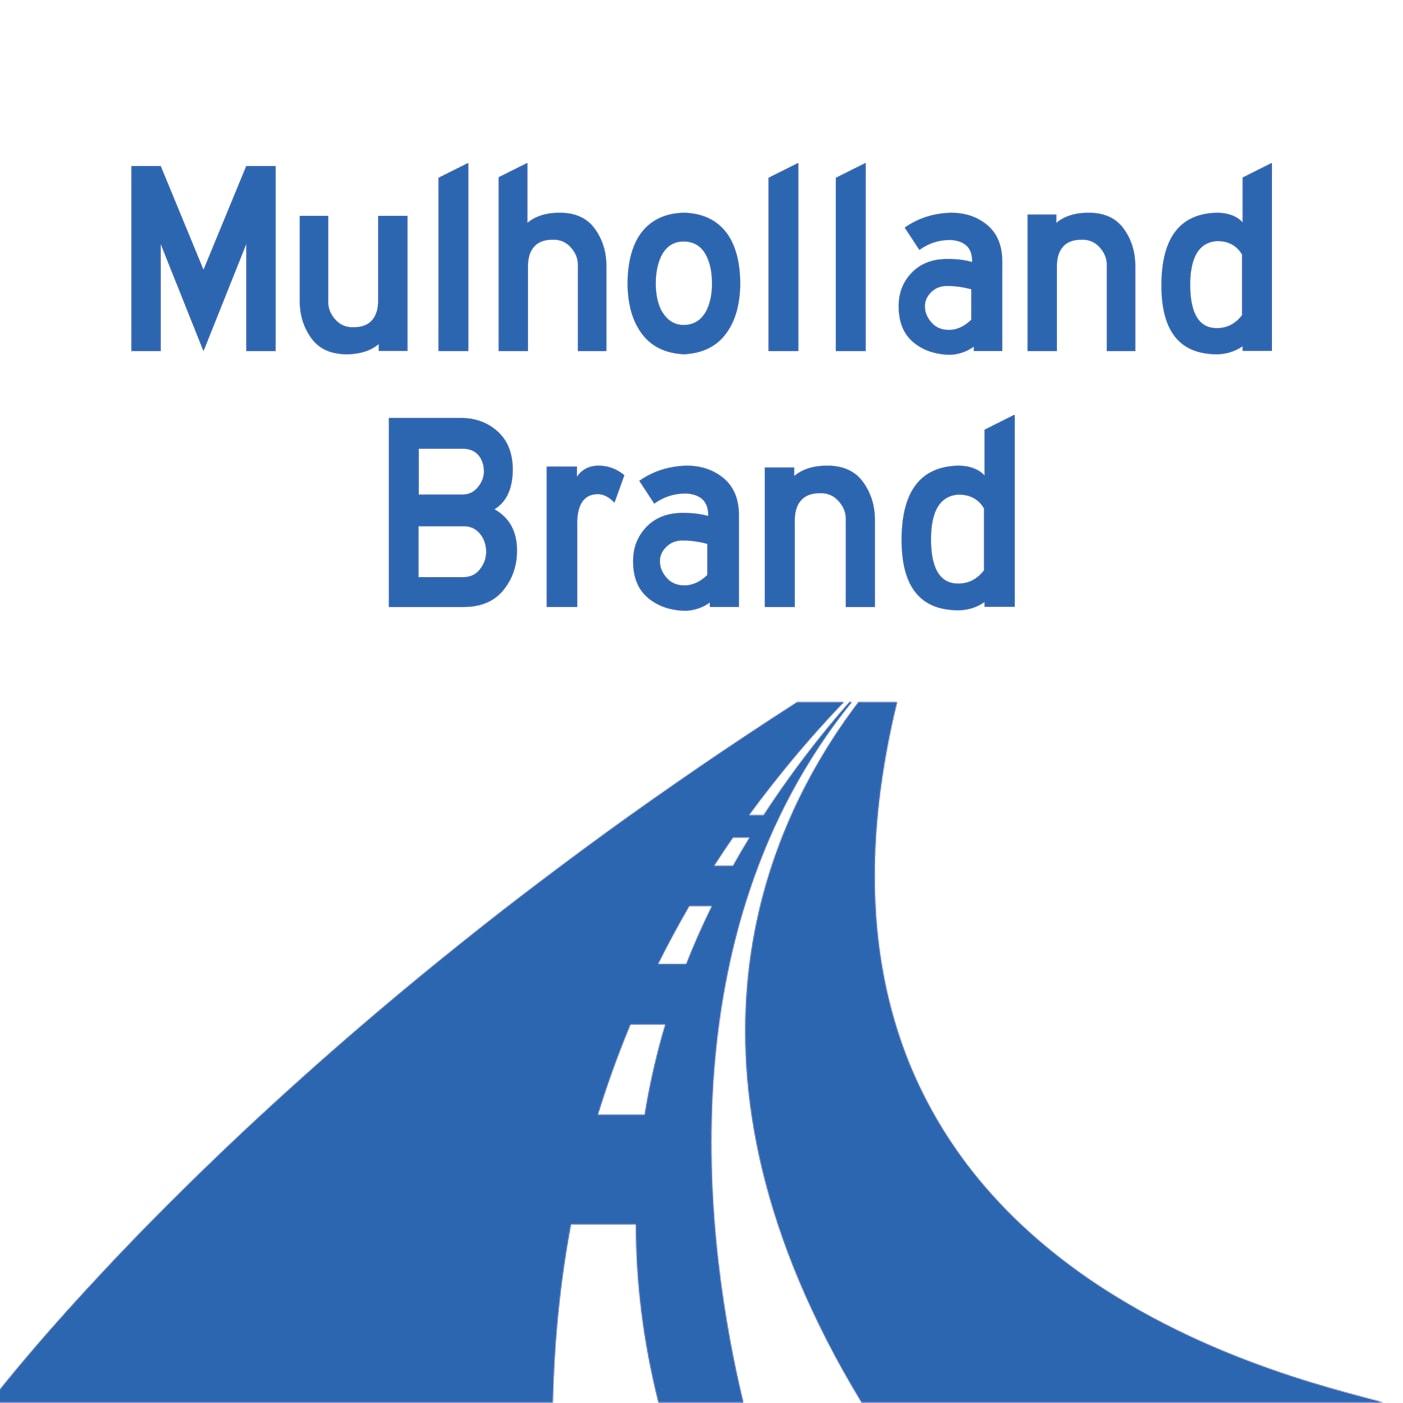 Mulholland Brand